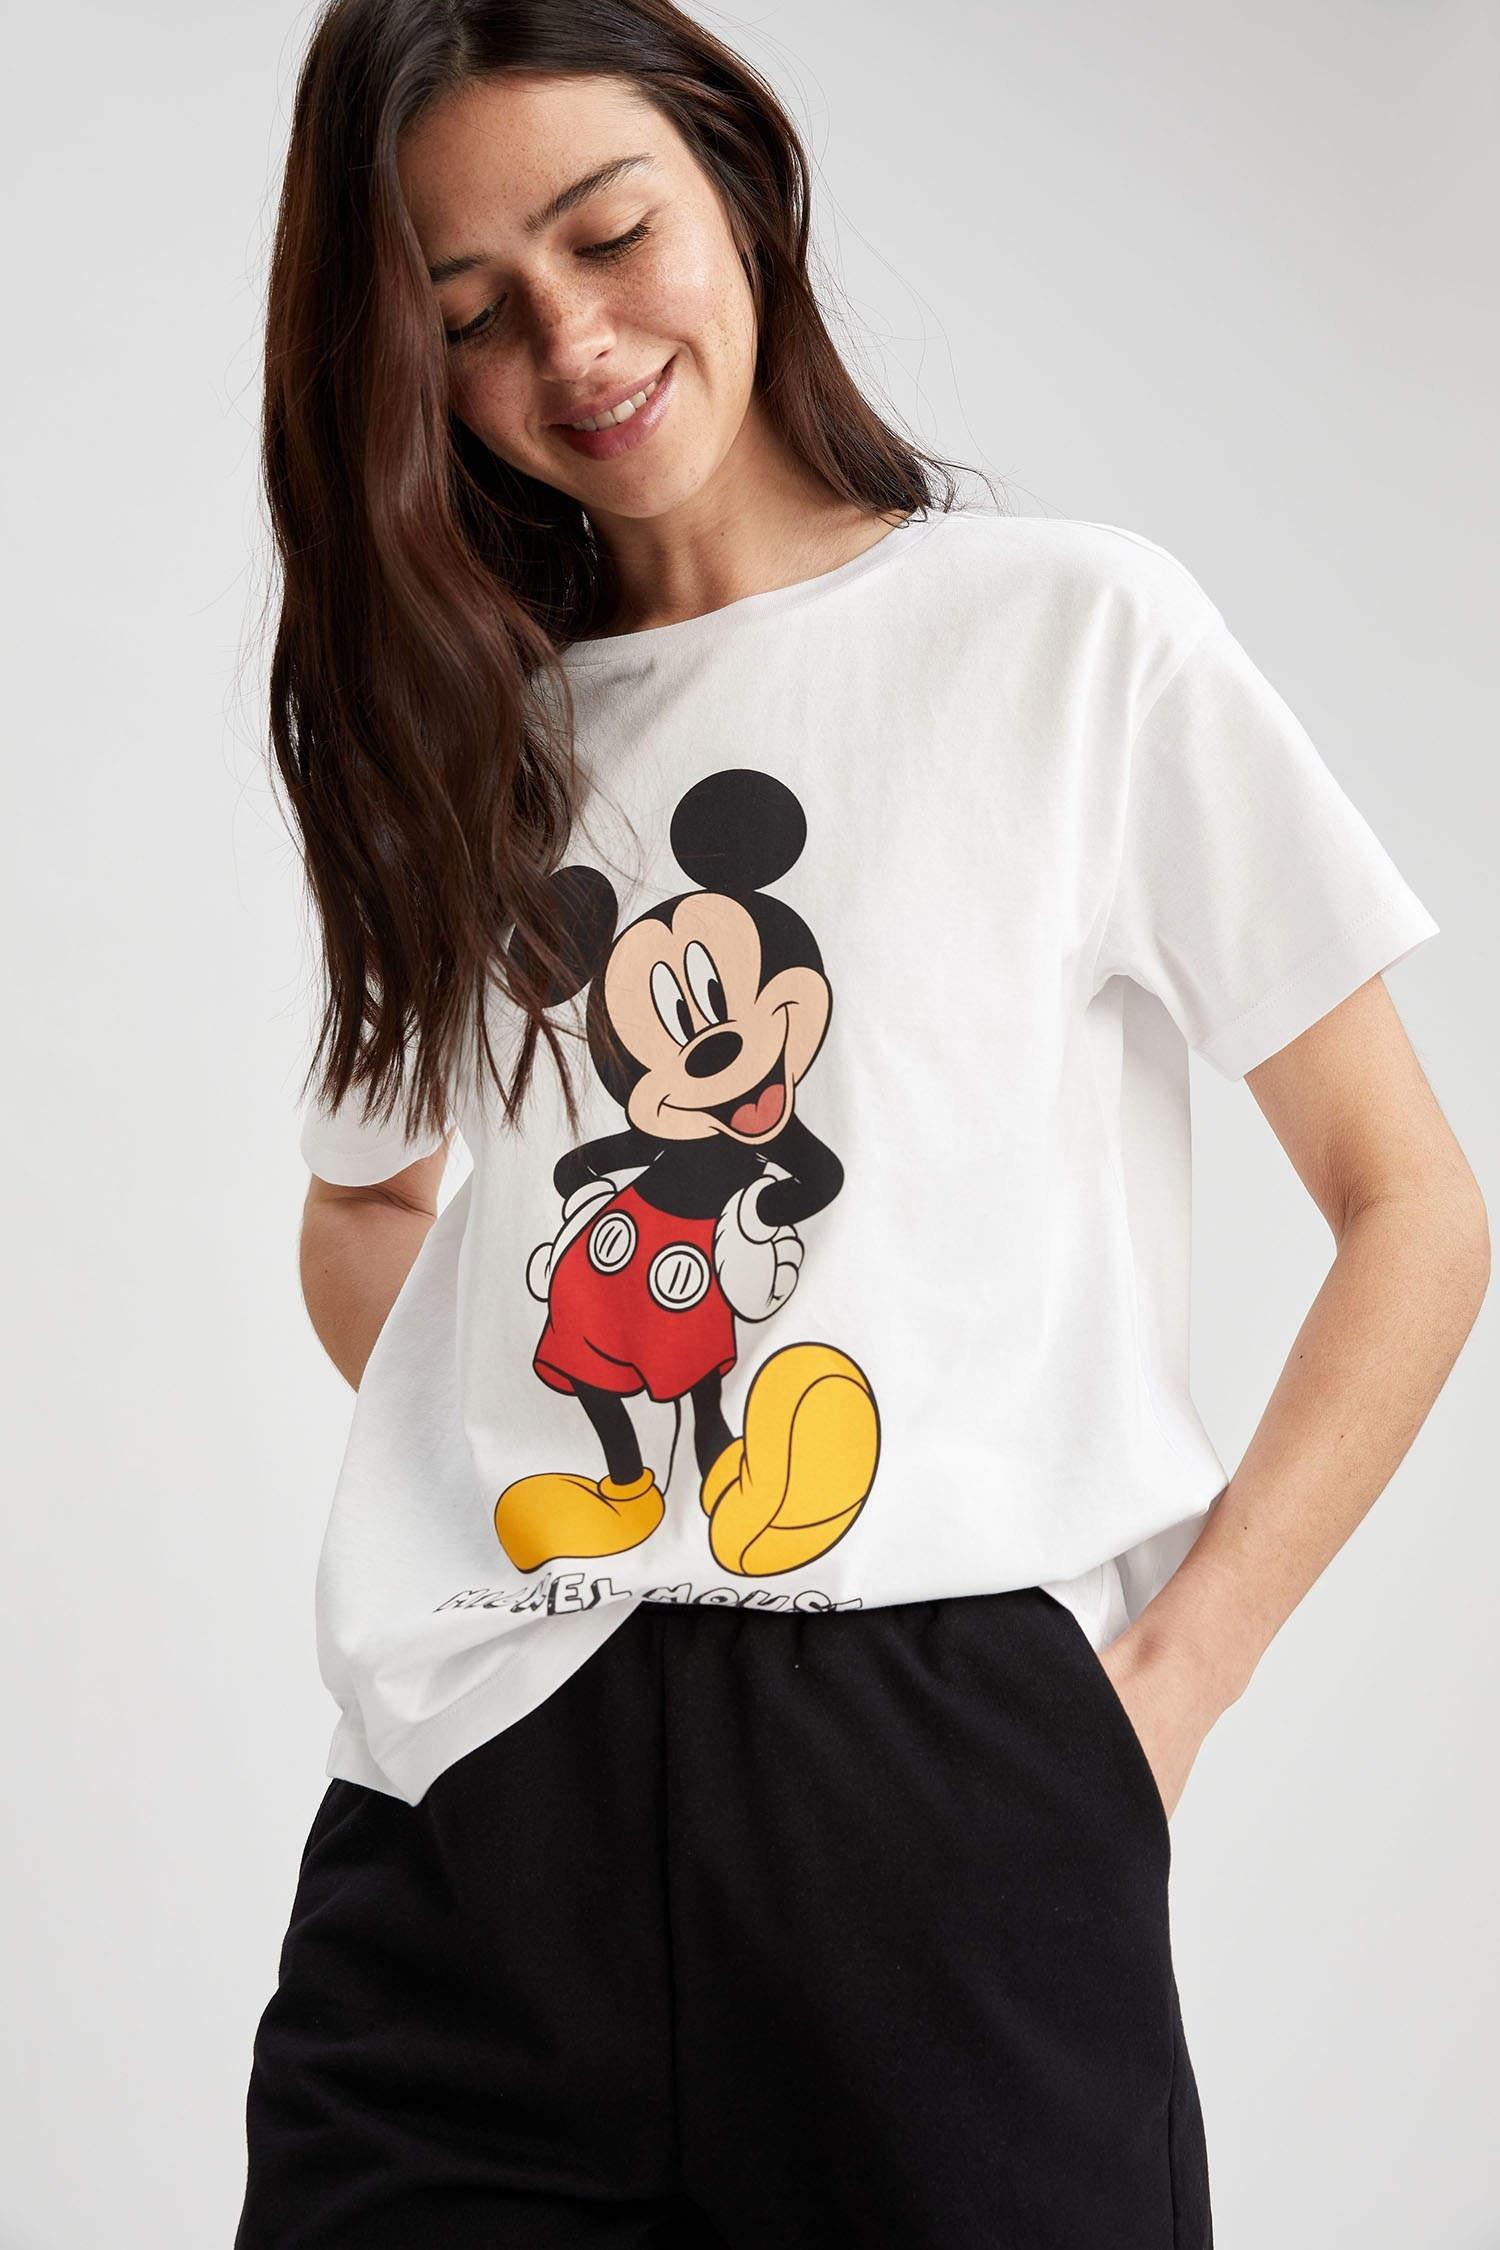 تصویر تی شرت نخی طرح میکی موس زنانه